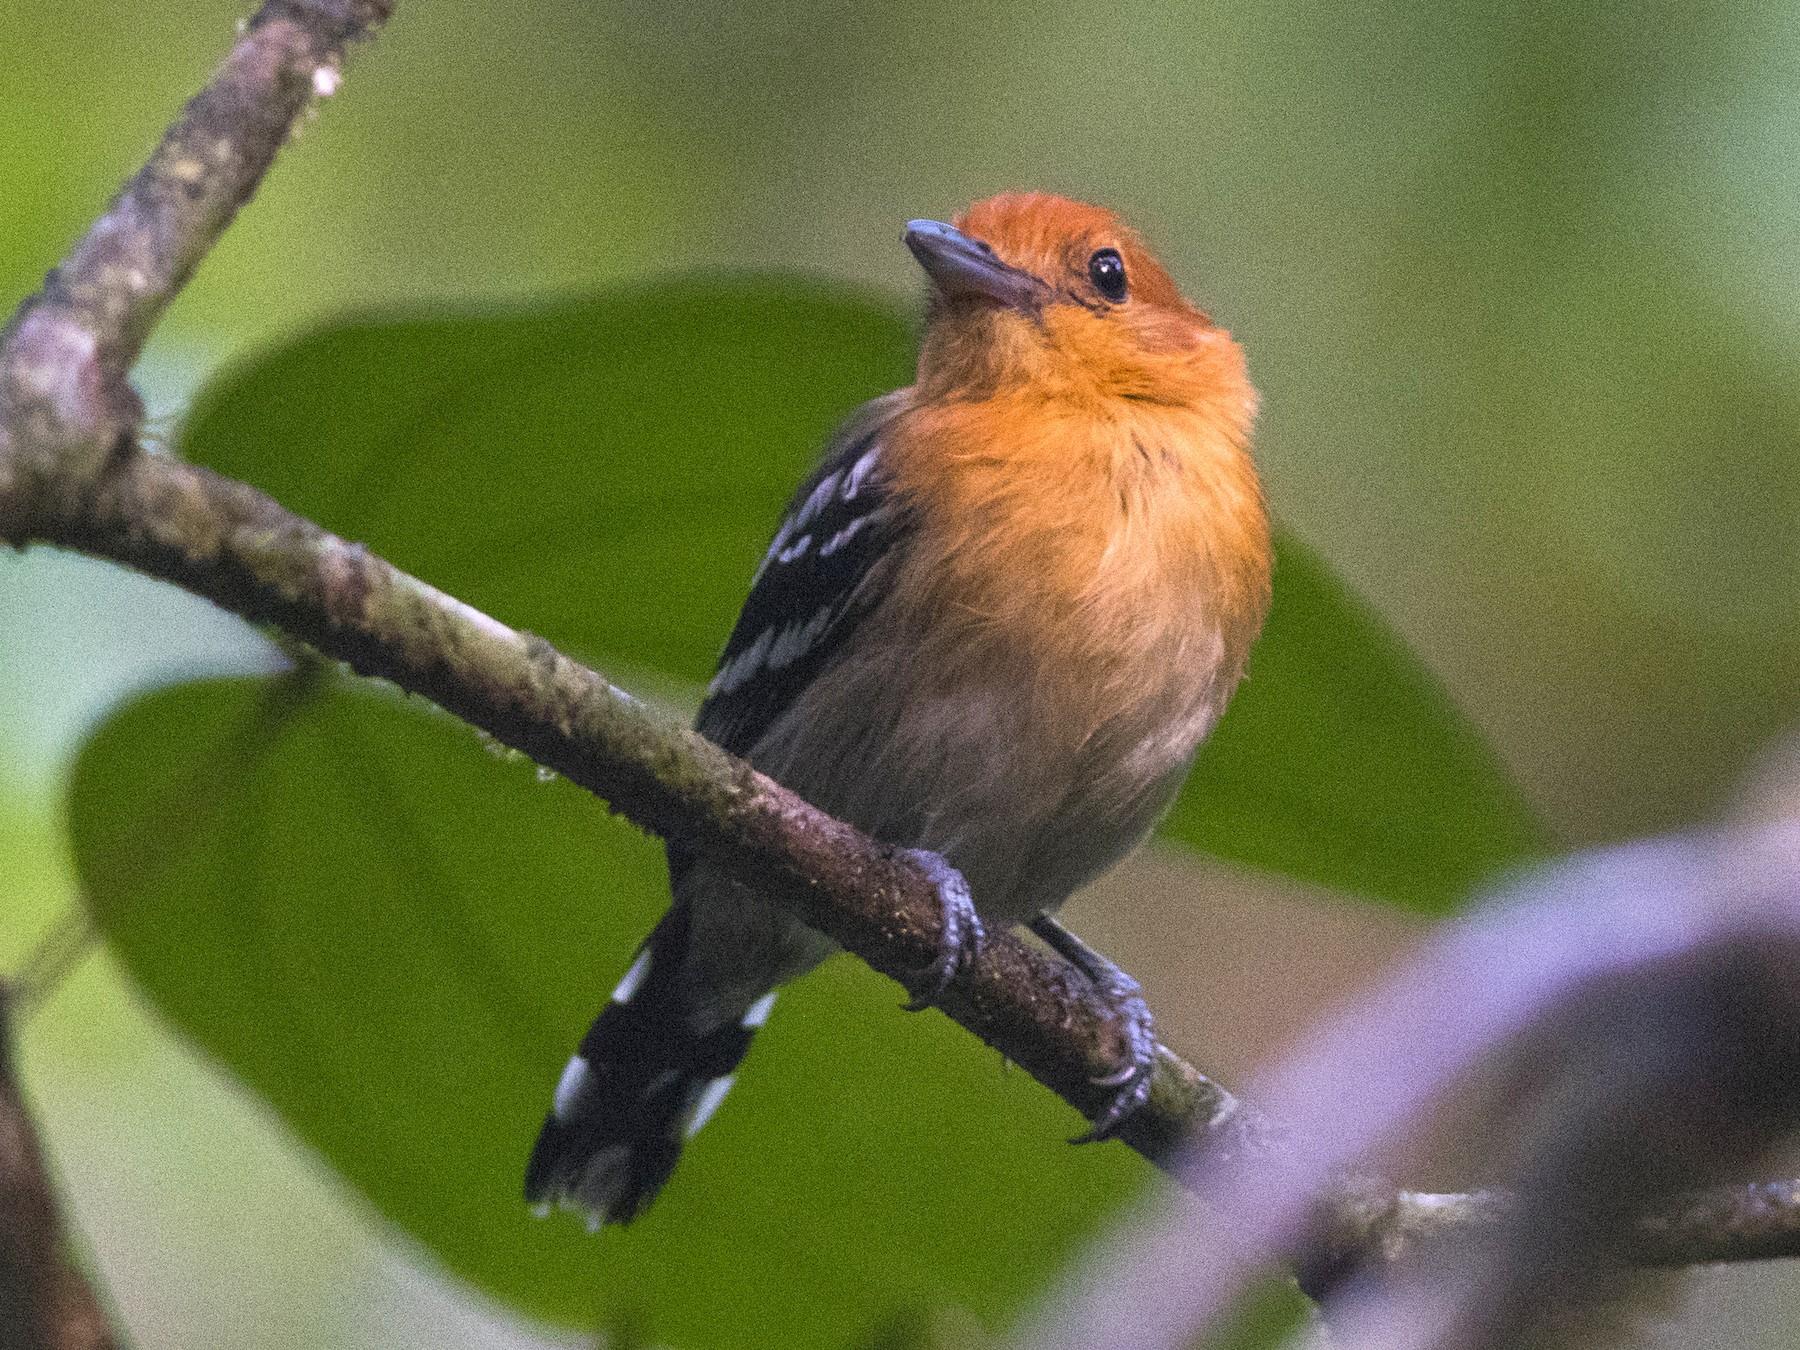 Amazonian Antshrike - John Cahill xikanel.com